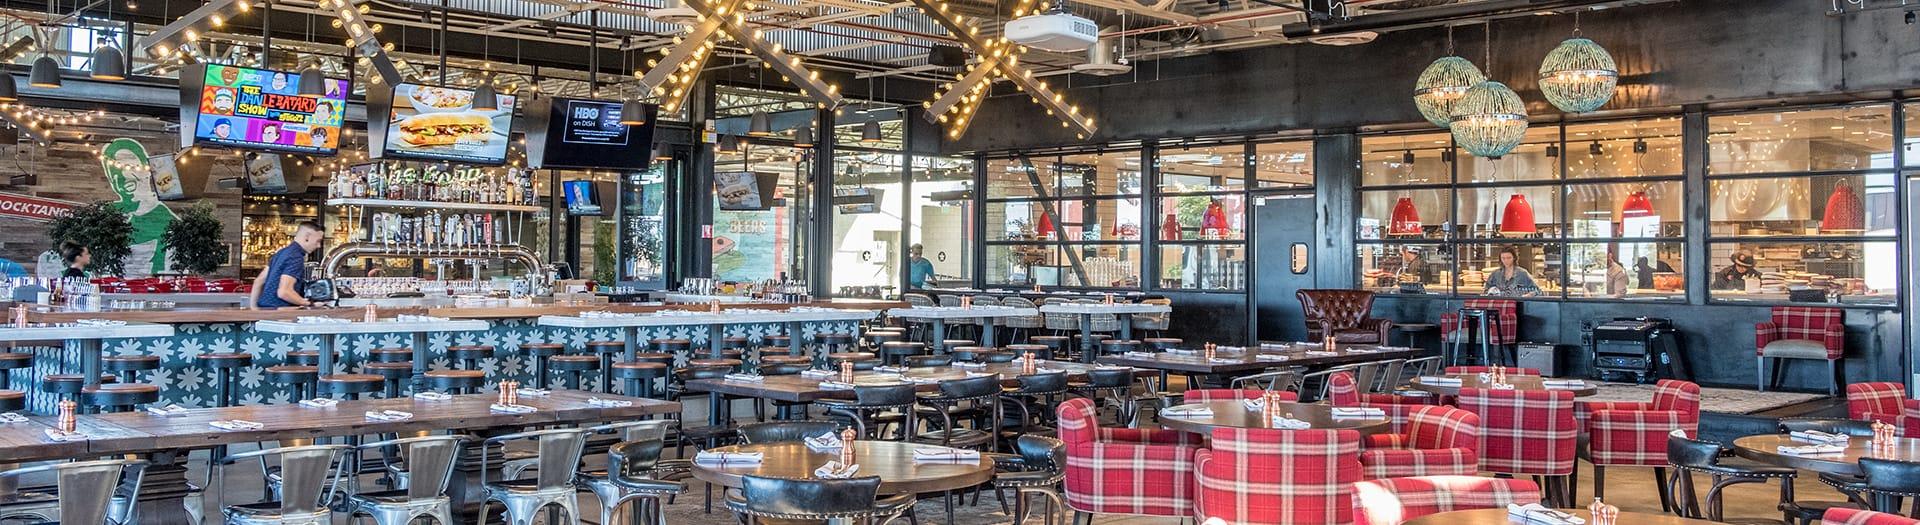 Culinary Dropout – Tucson - Tucson, AZ